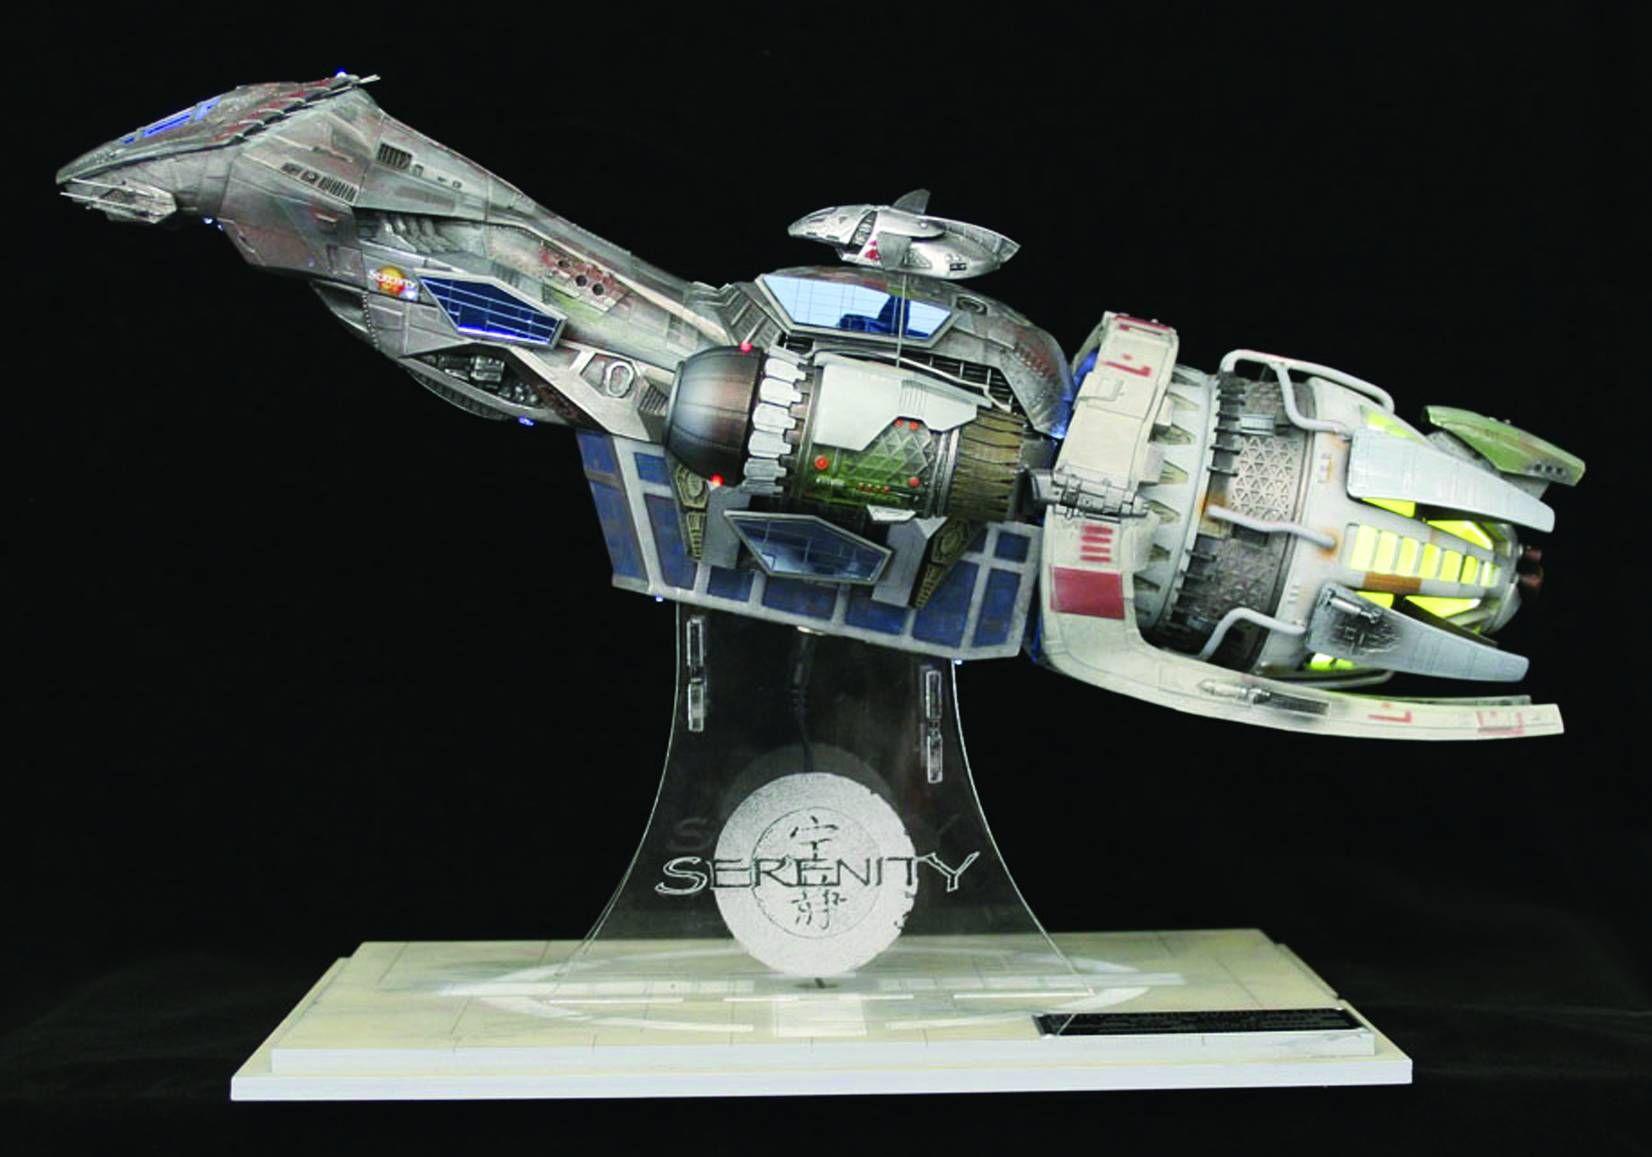 Firefly, Serenity Ship Replica.